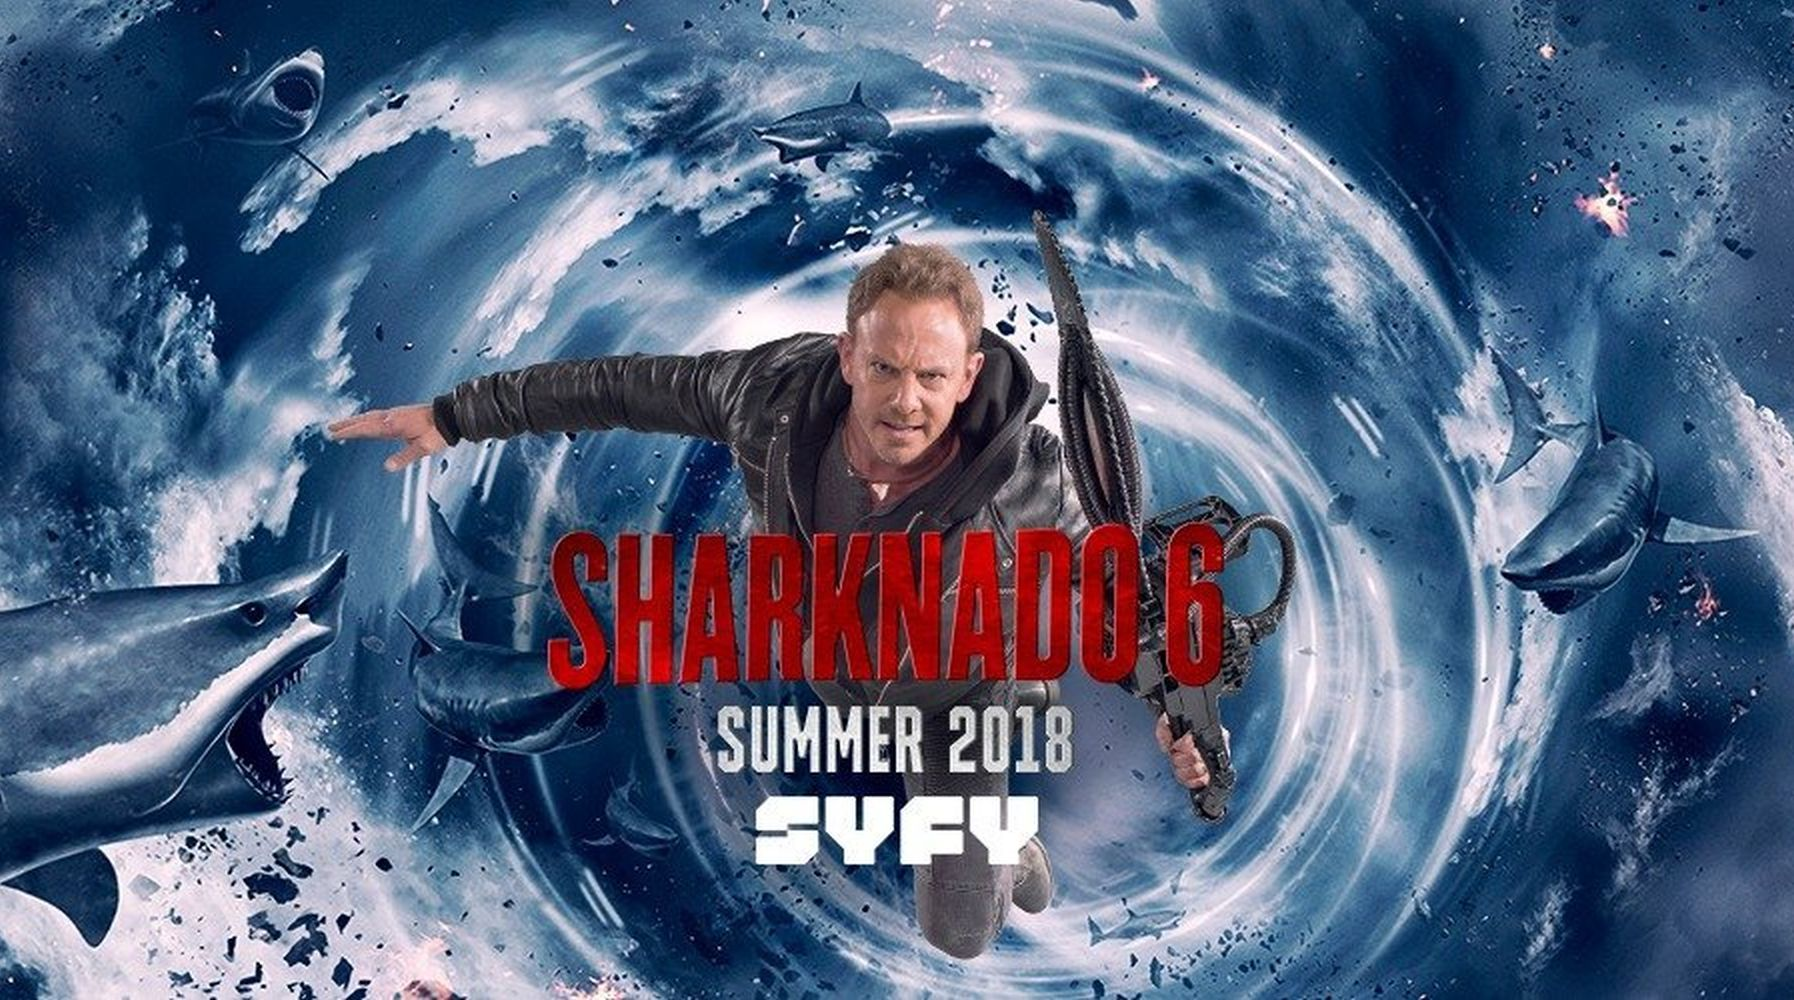 Shark Absorbers: Shark Week 2018 on the SyFy Channel - Film Blitz